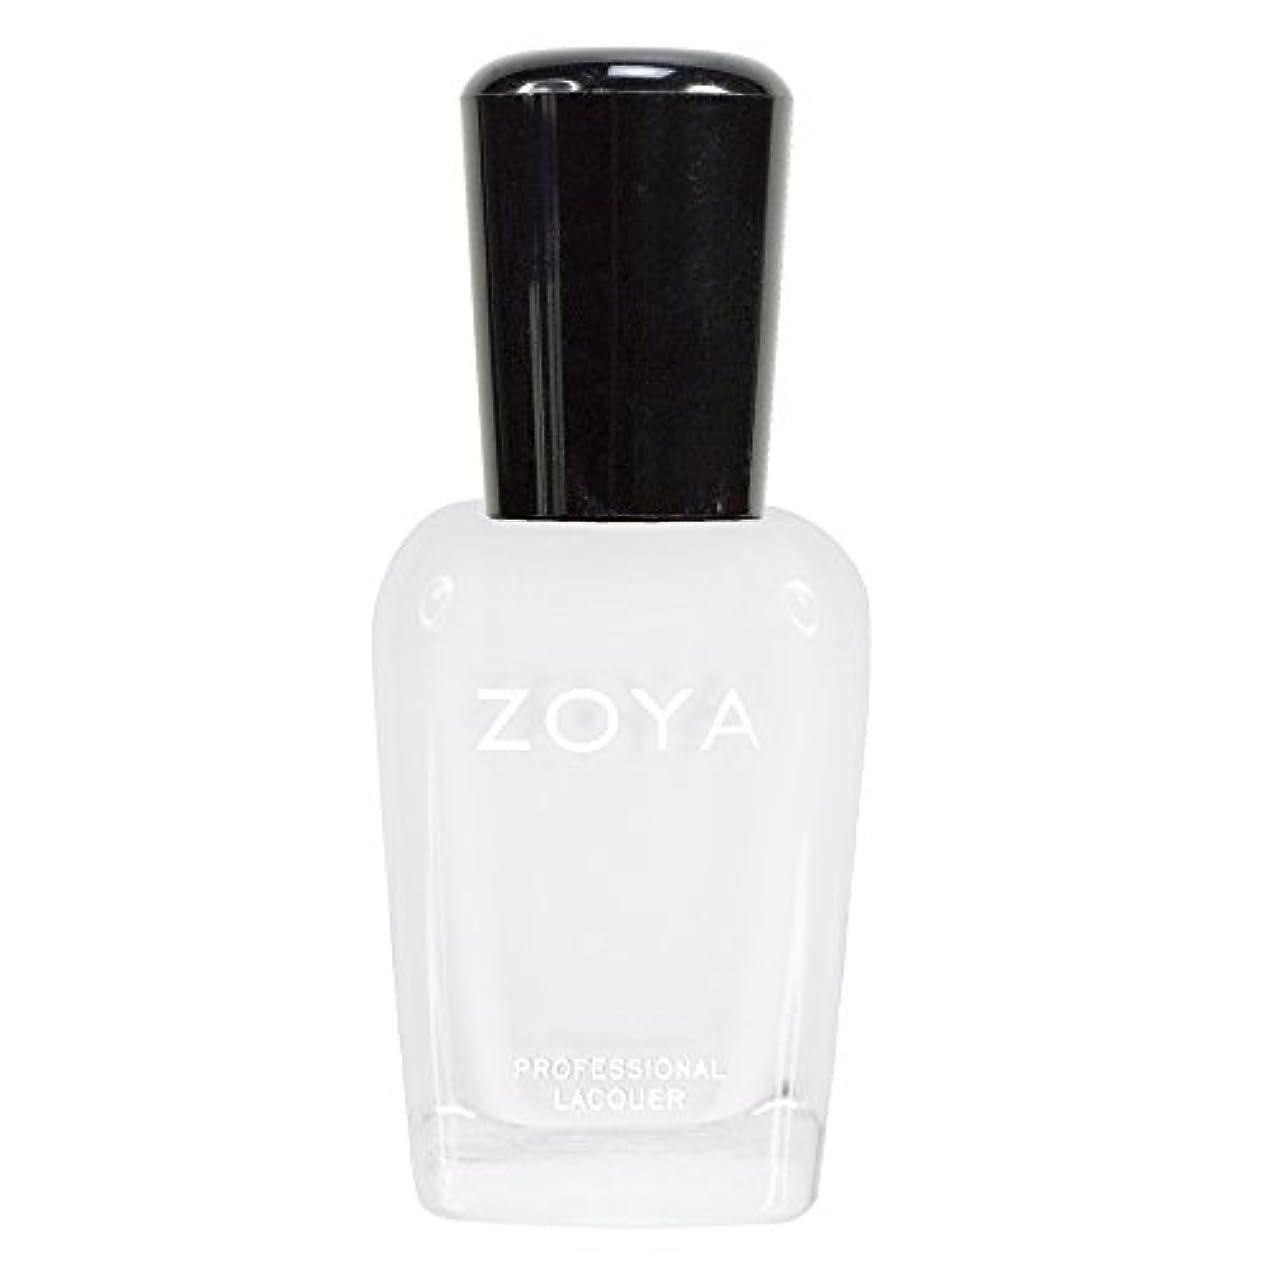 ZOYA ゾーヤ ネイルカラーZP388 PURITY ピュリティ  15ml ホワイト マット 爪にやさしいネイルラッカーマニキュア